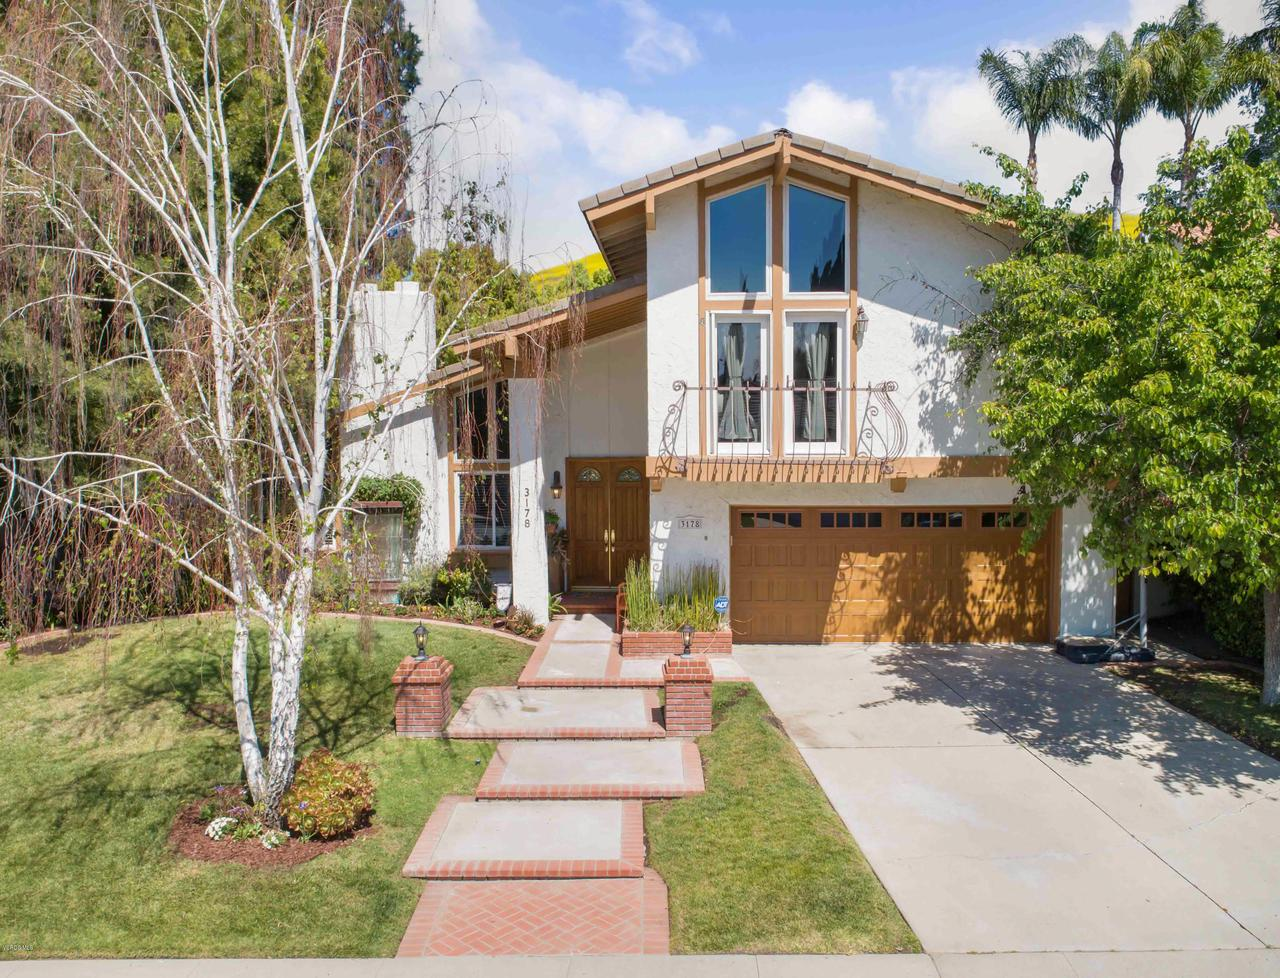 3178 BLACK HILLS, Westlake Village, CA 91362 - black hills photos-3